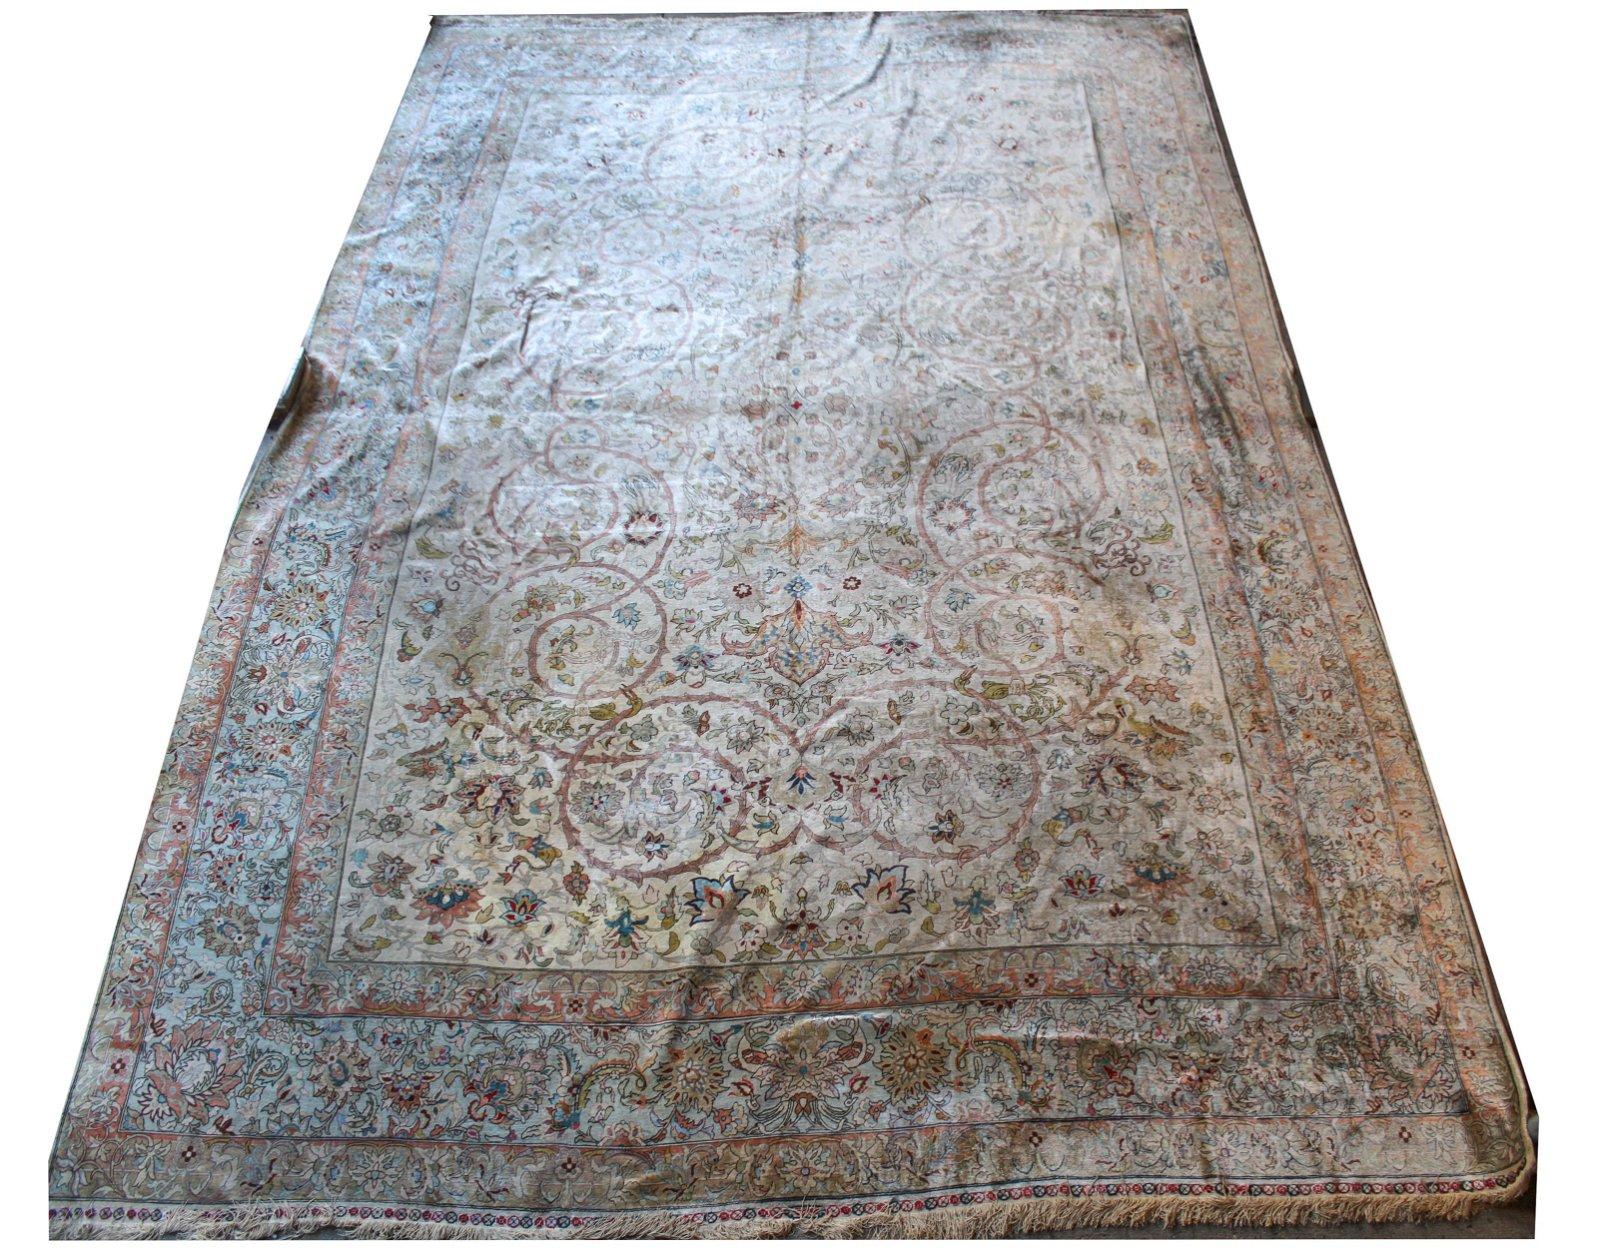 "Signed Persian Garden Silk Carpet 16' 10"" L x 11' 6"" W."